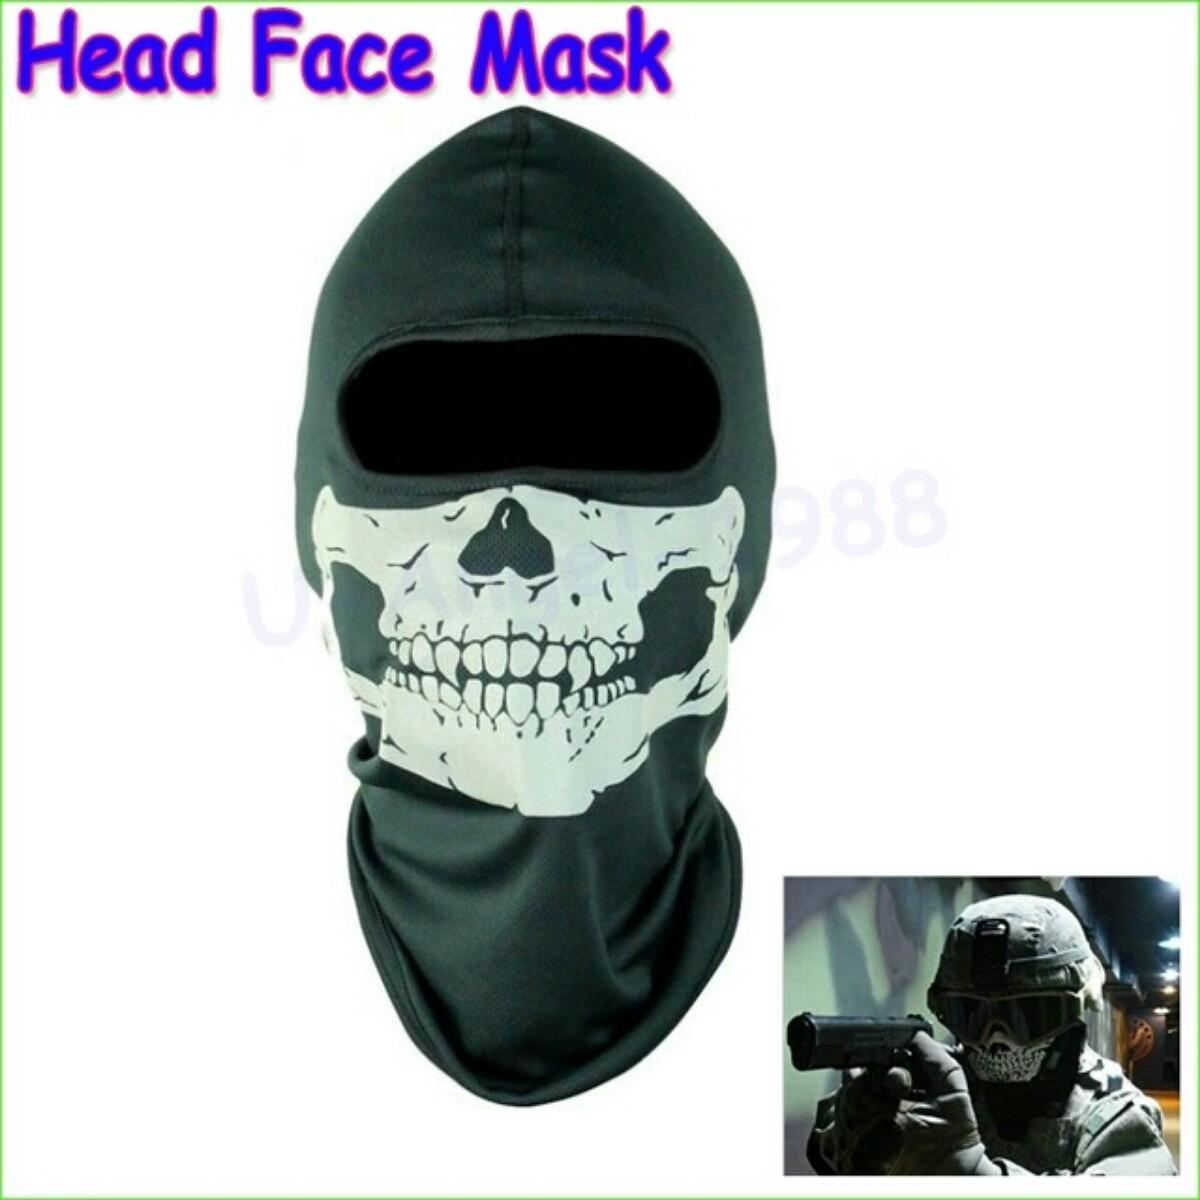 Call Of Duty 10 Cod Ghosts Logan Balaclava Ski Skull Hood: Pasamontaas Mscara QMFIVE Camuflage Cara Completa Militar